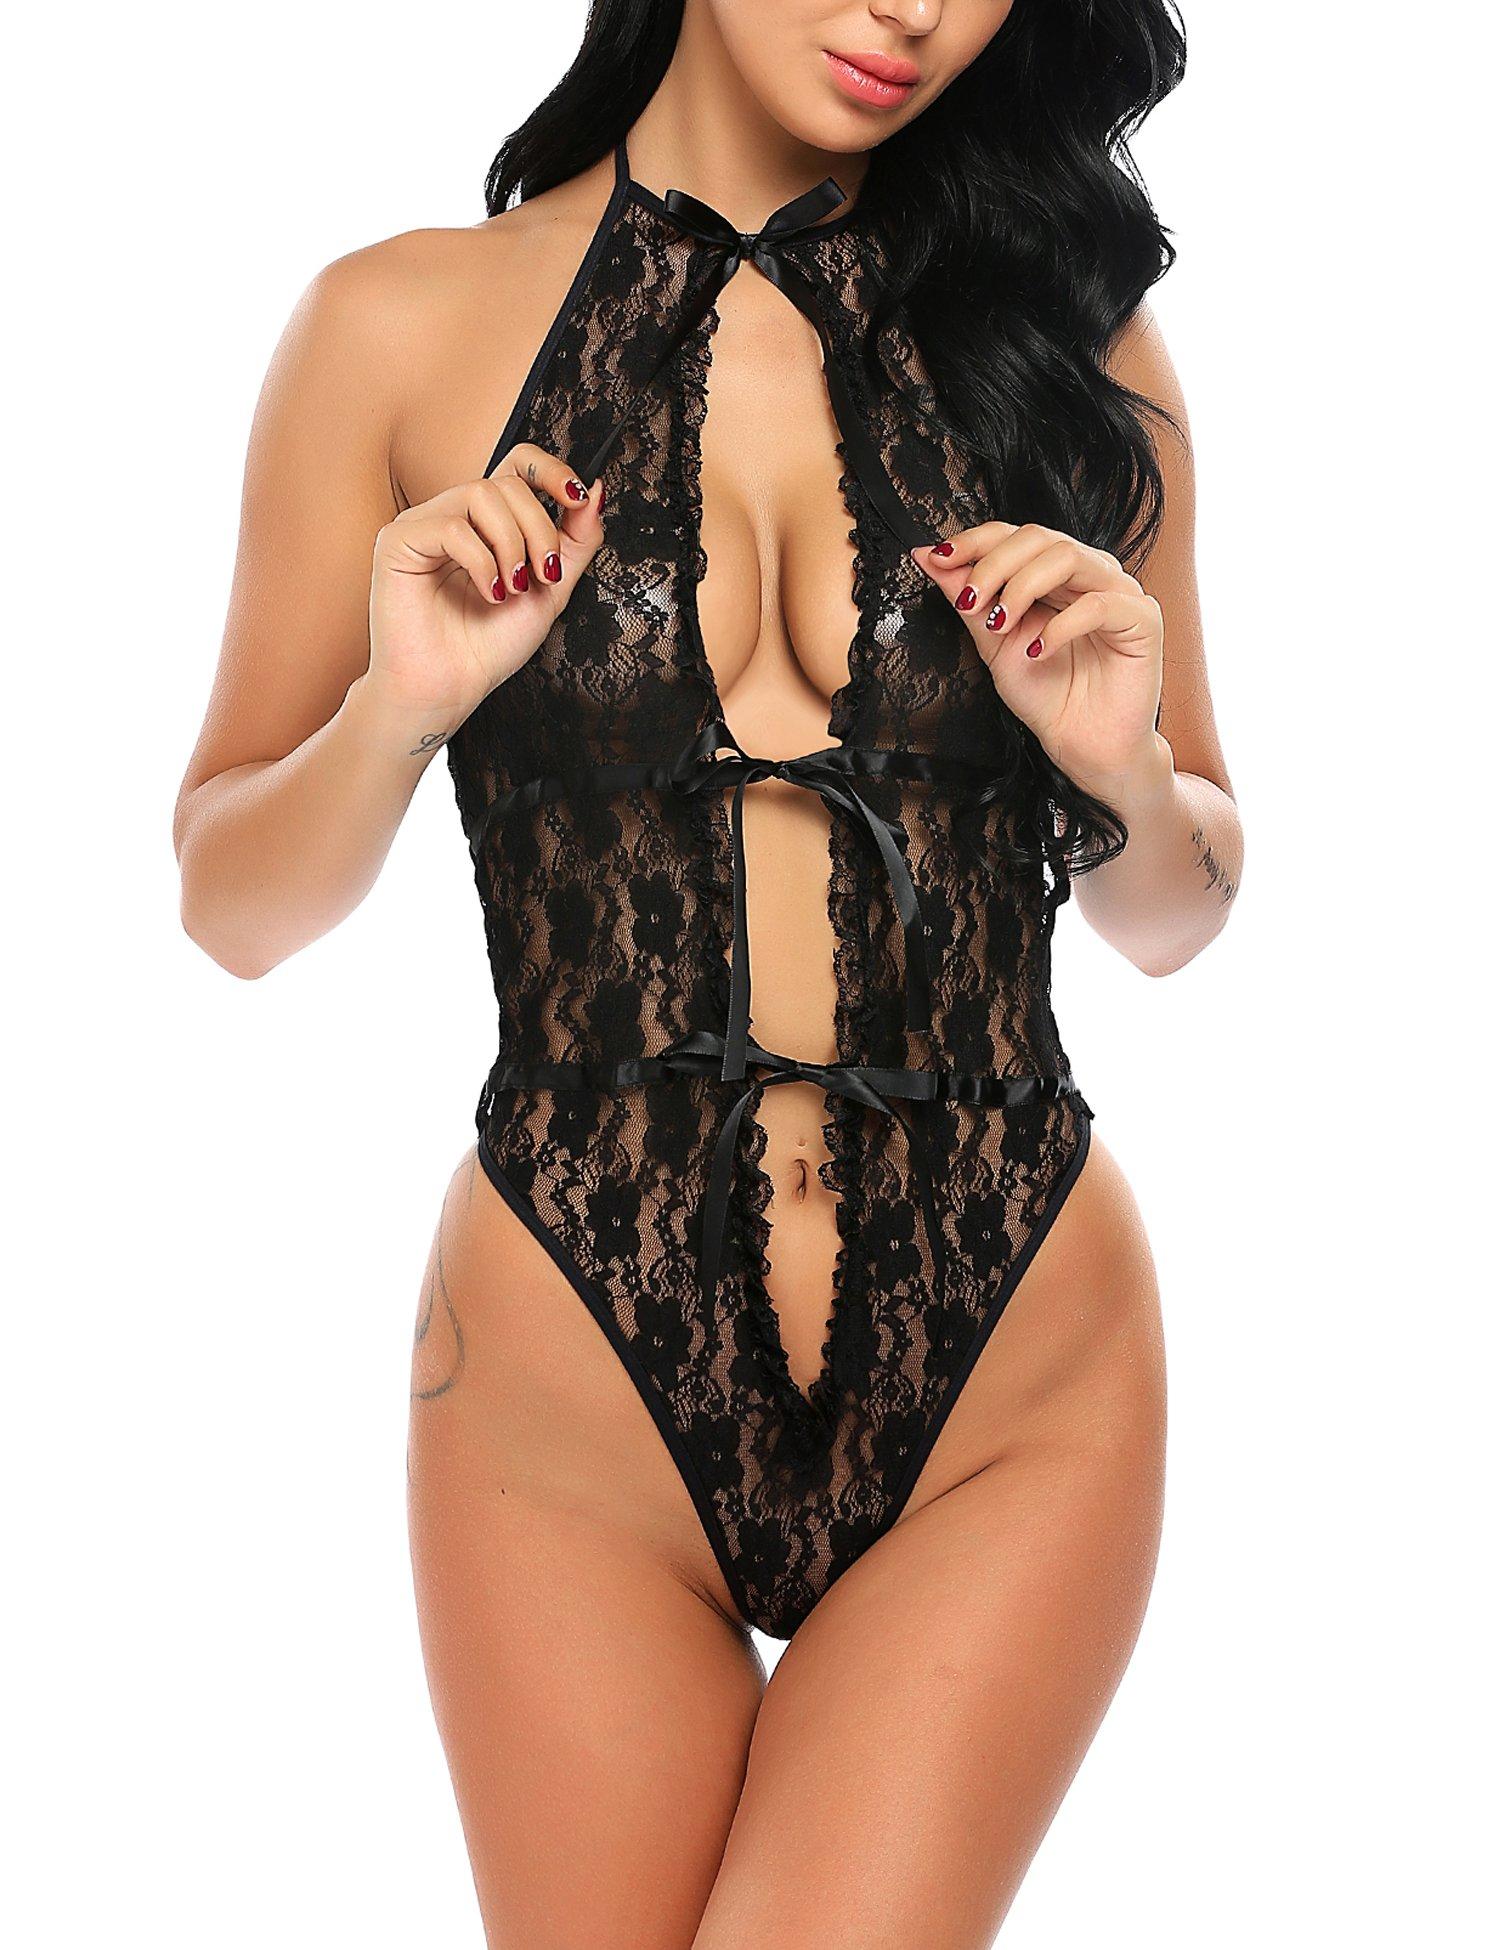 Women Sexy Lingerie Teddy One Piece Chemises Lace Halter Babydoll Bodysuit